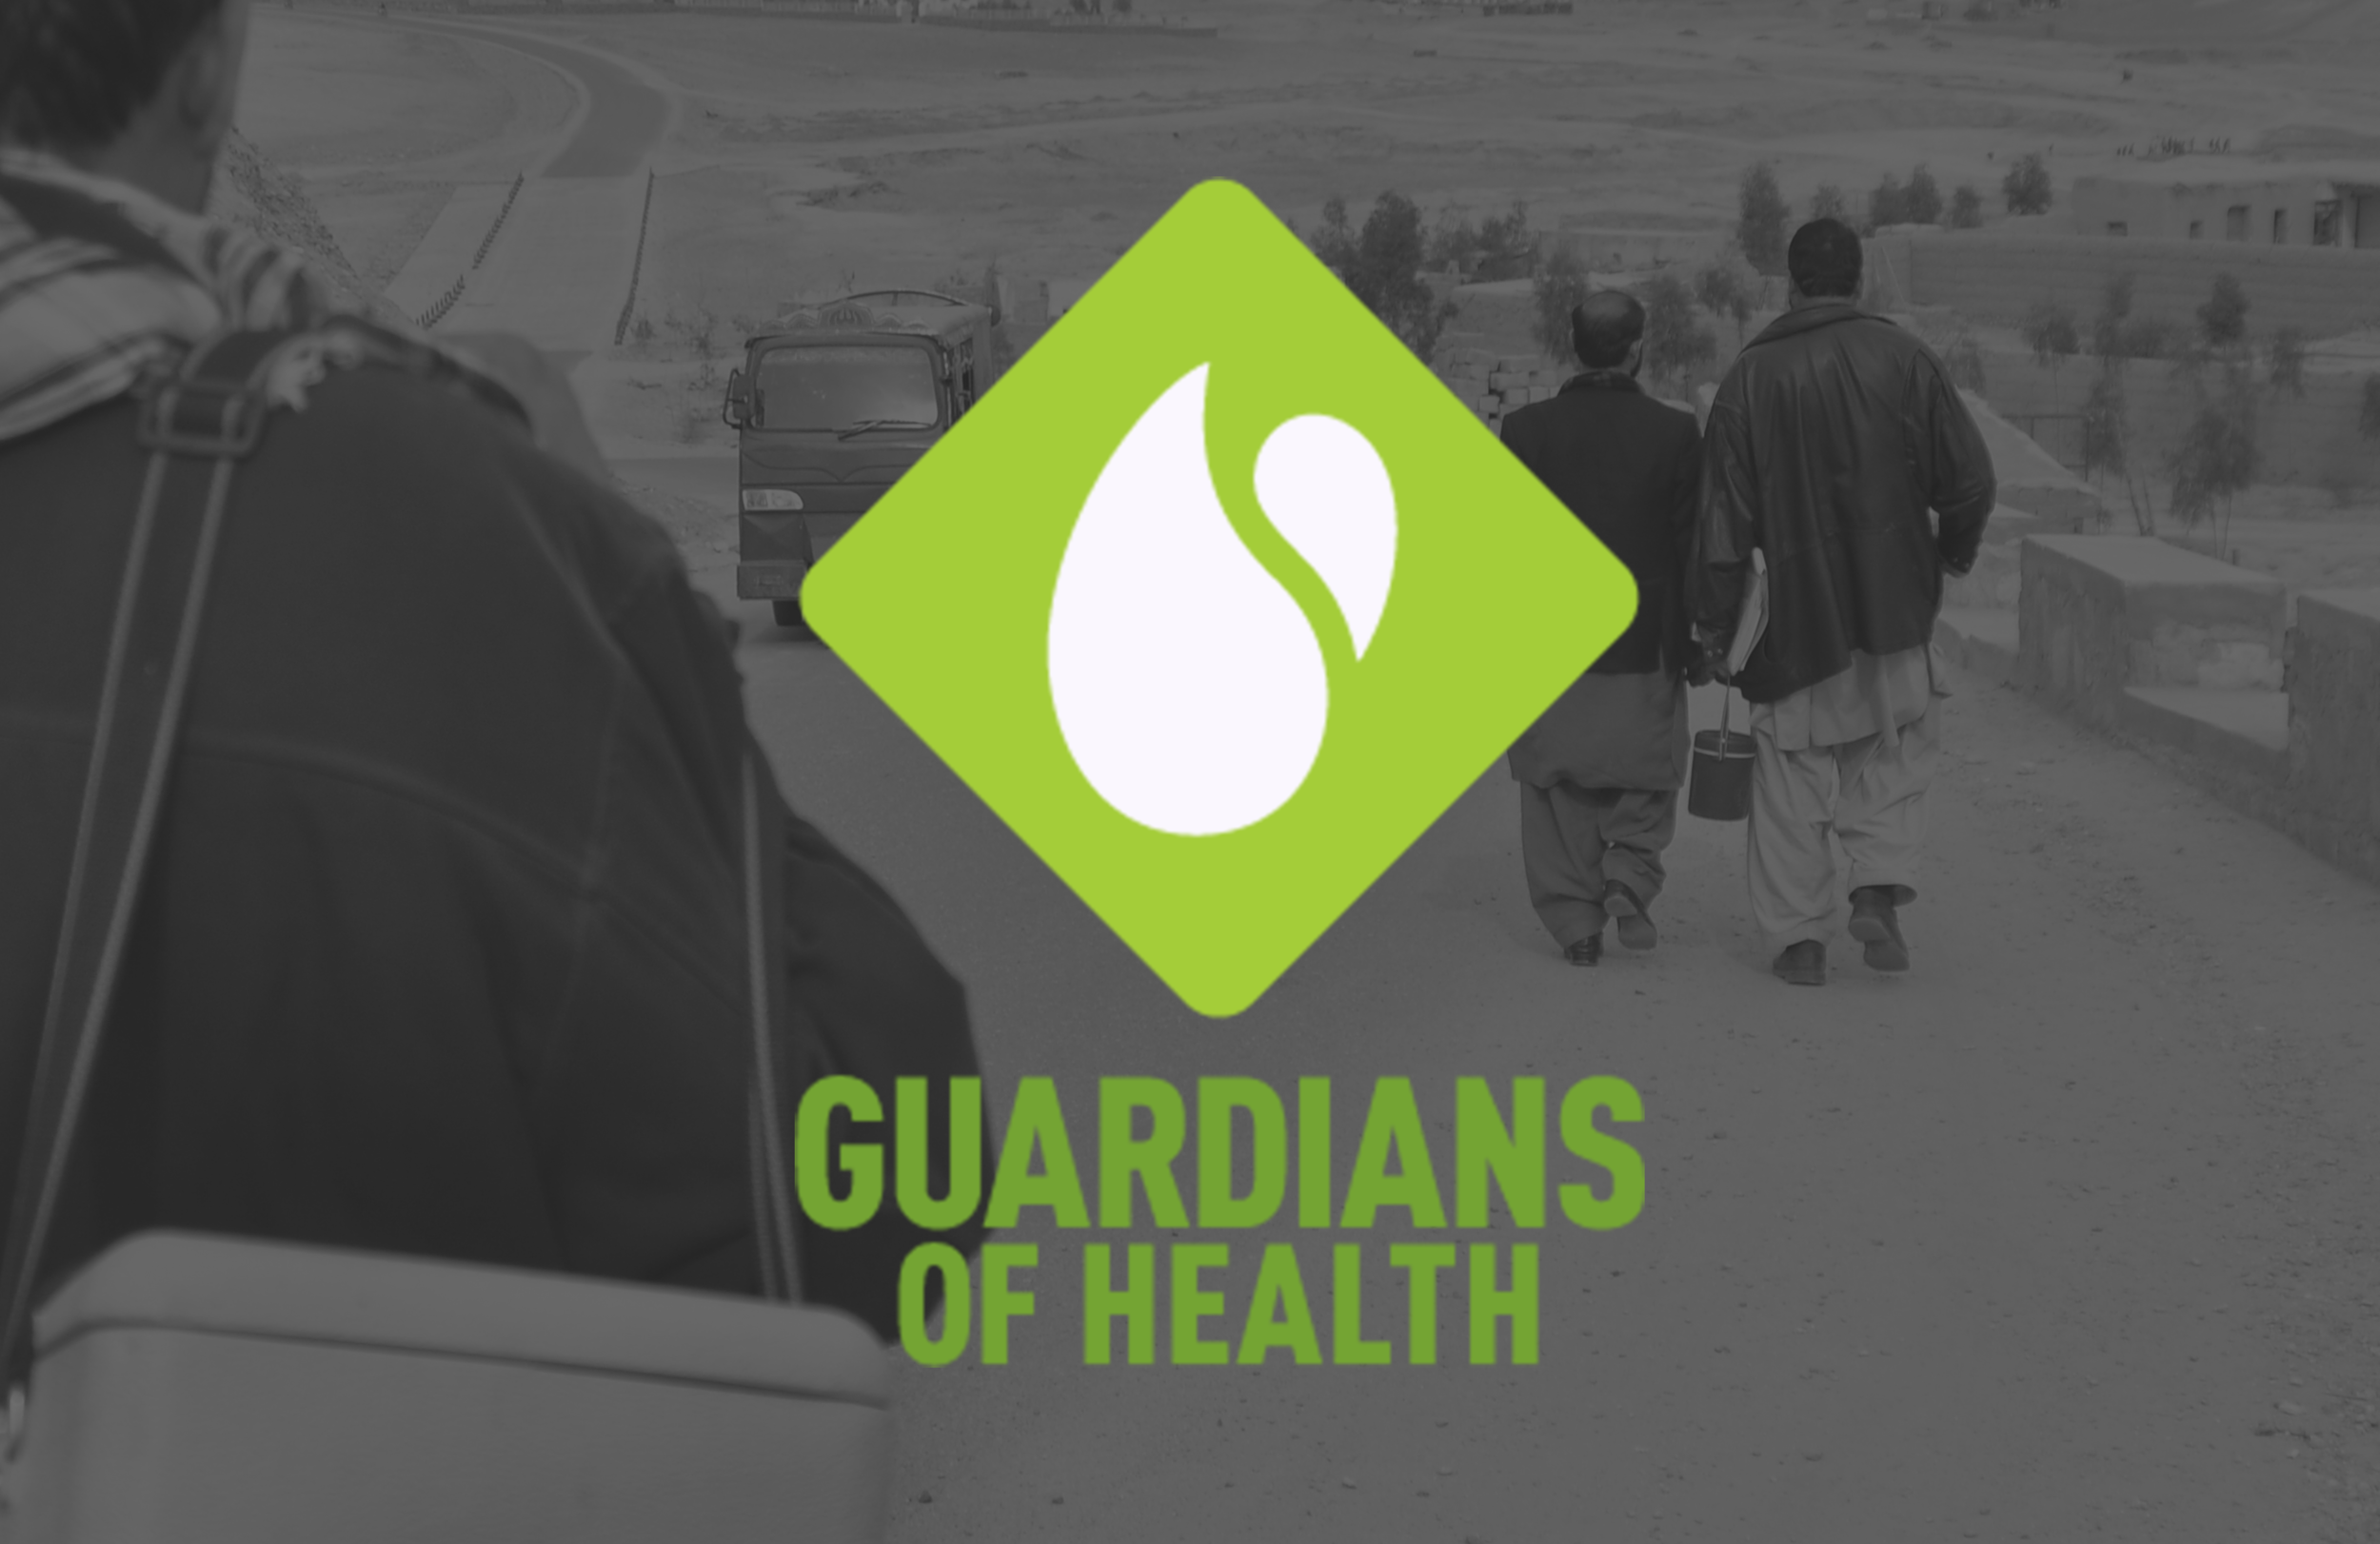 GUARDIANS OF HEALTH POLIO CAMPAIGN